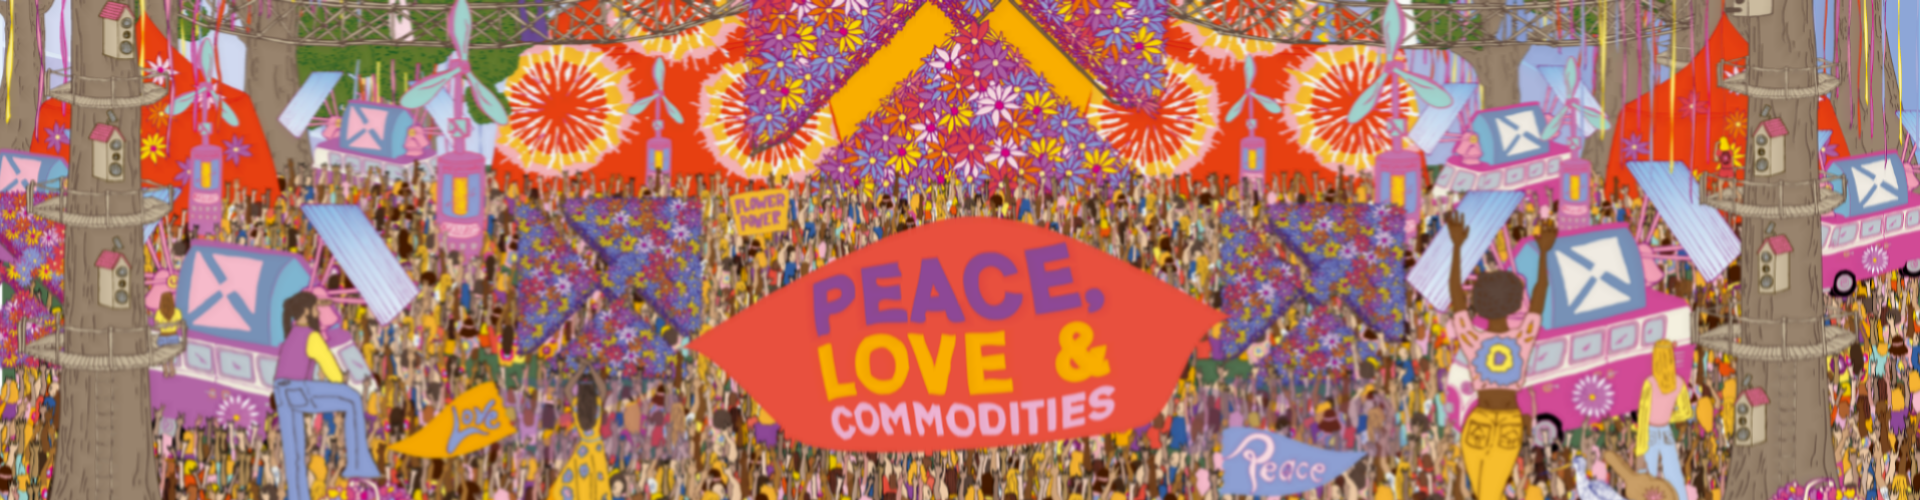 TXF Global Commodity Finance 2019: Amsterdam